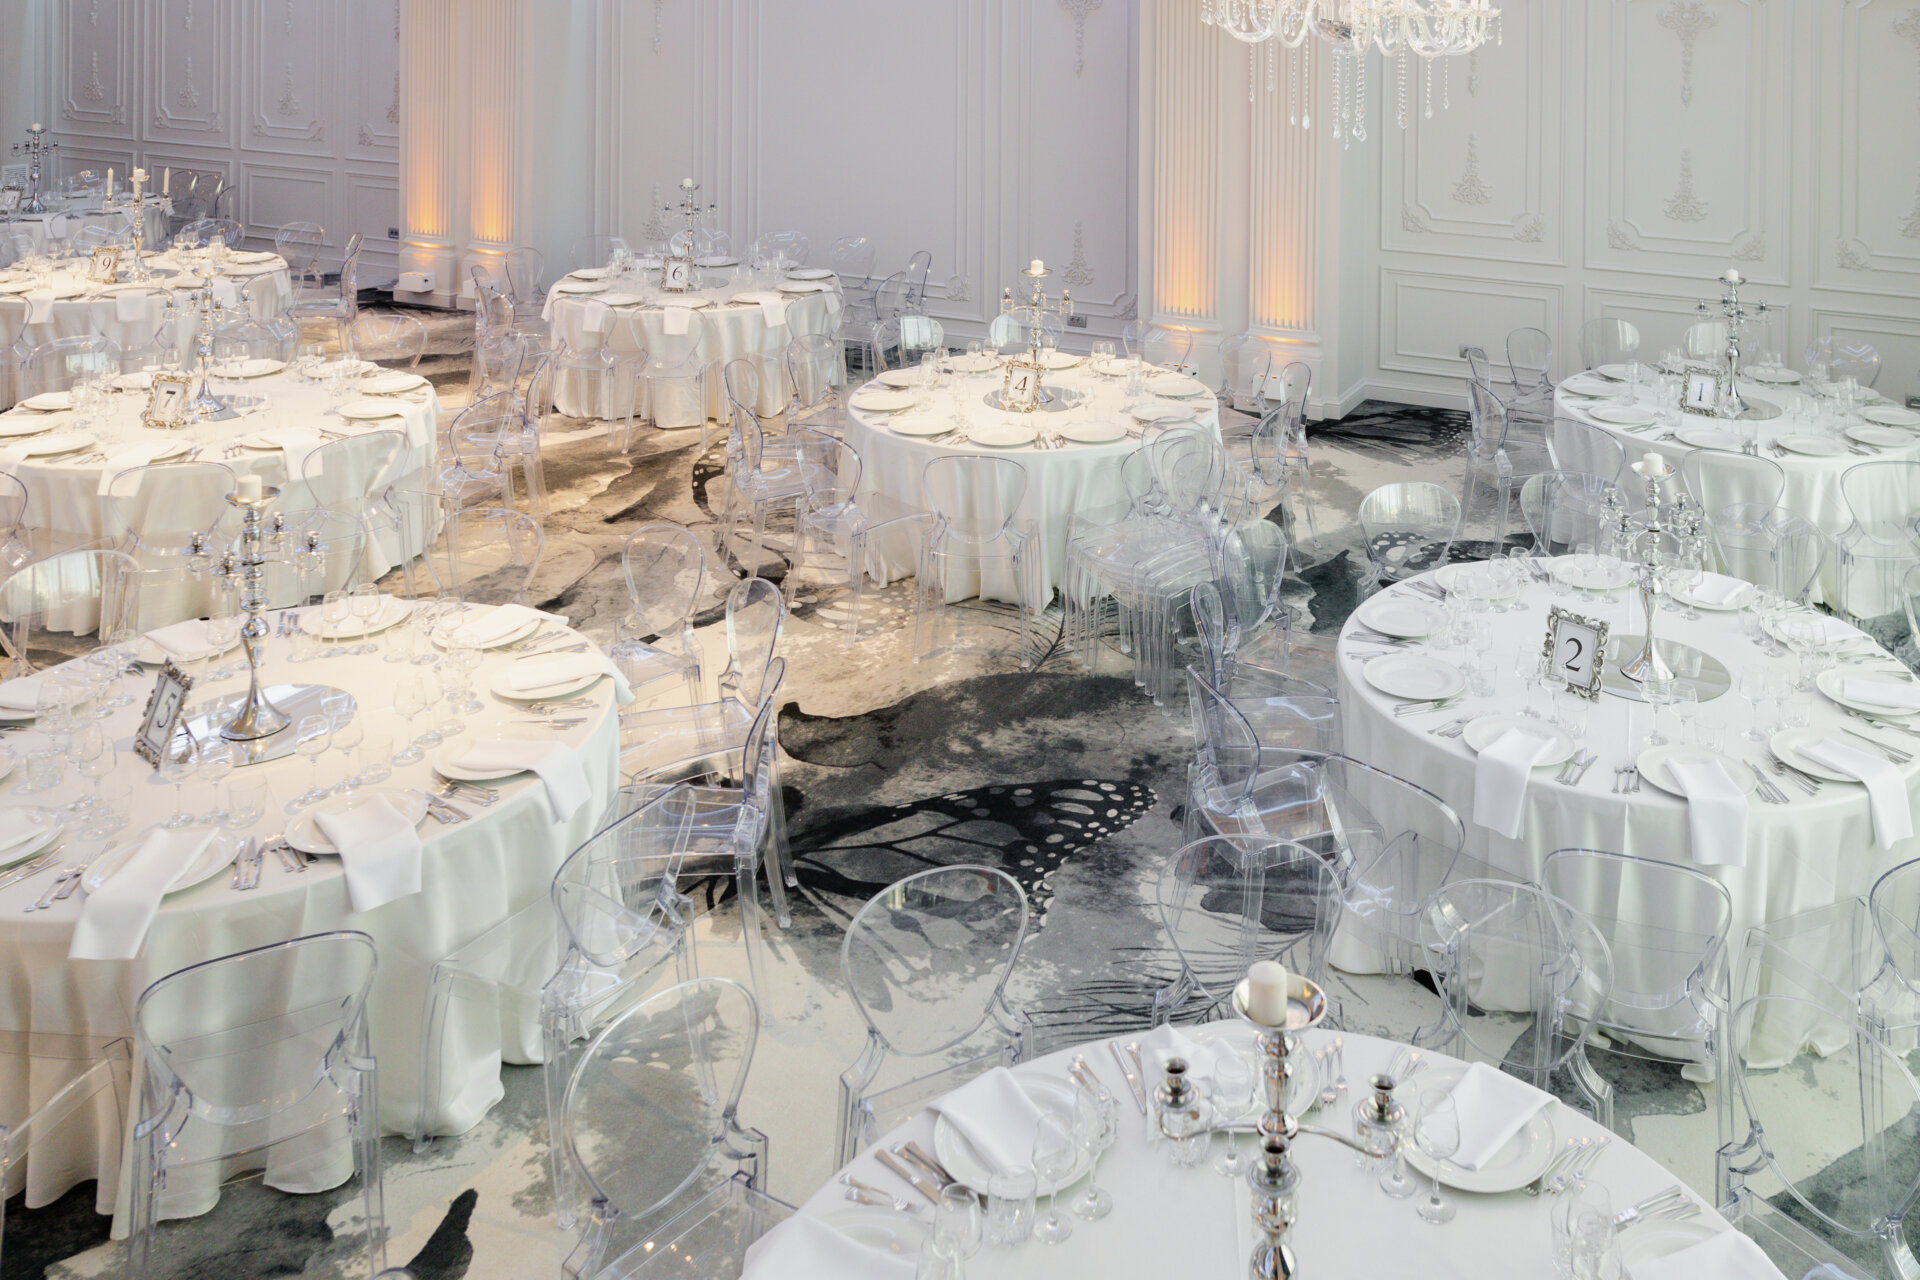 20210303-carpet&more-hotel-rocca-craiovaby-hugmedia-15